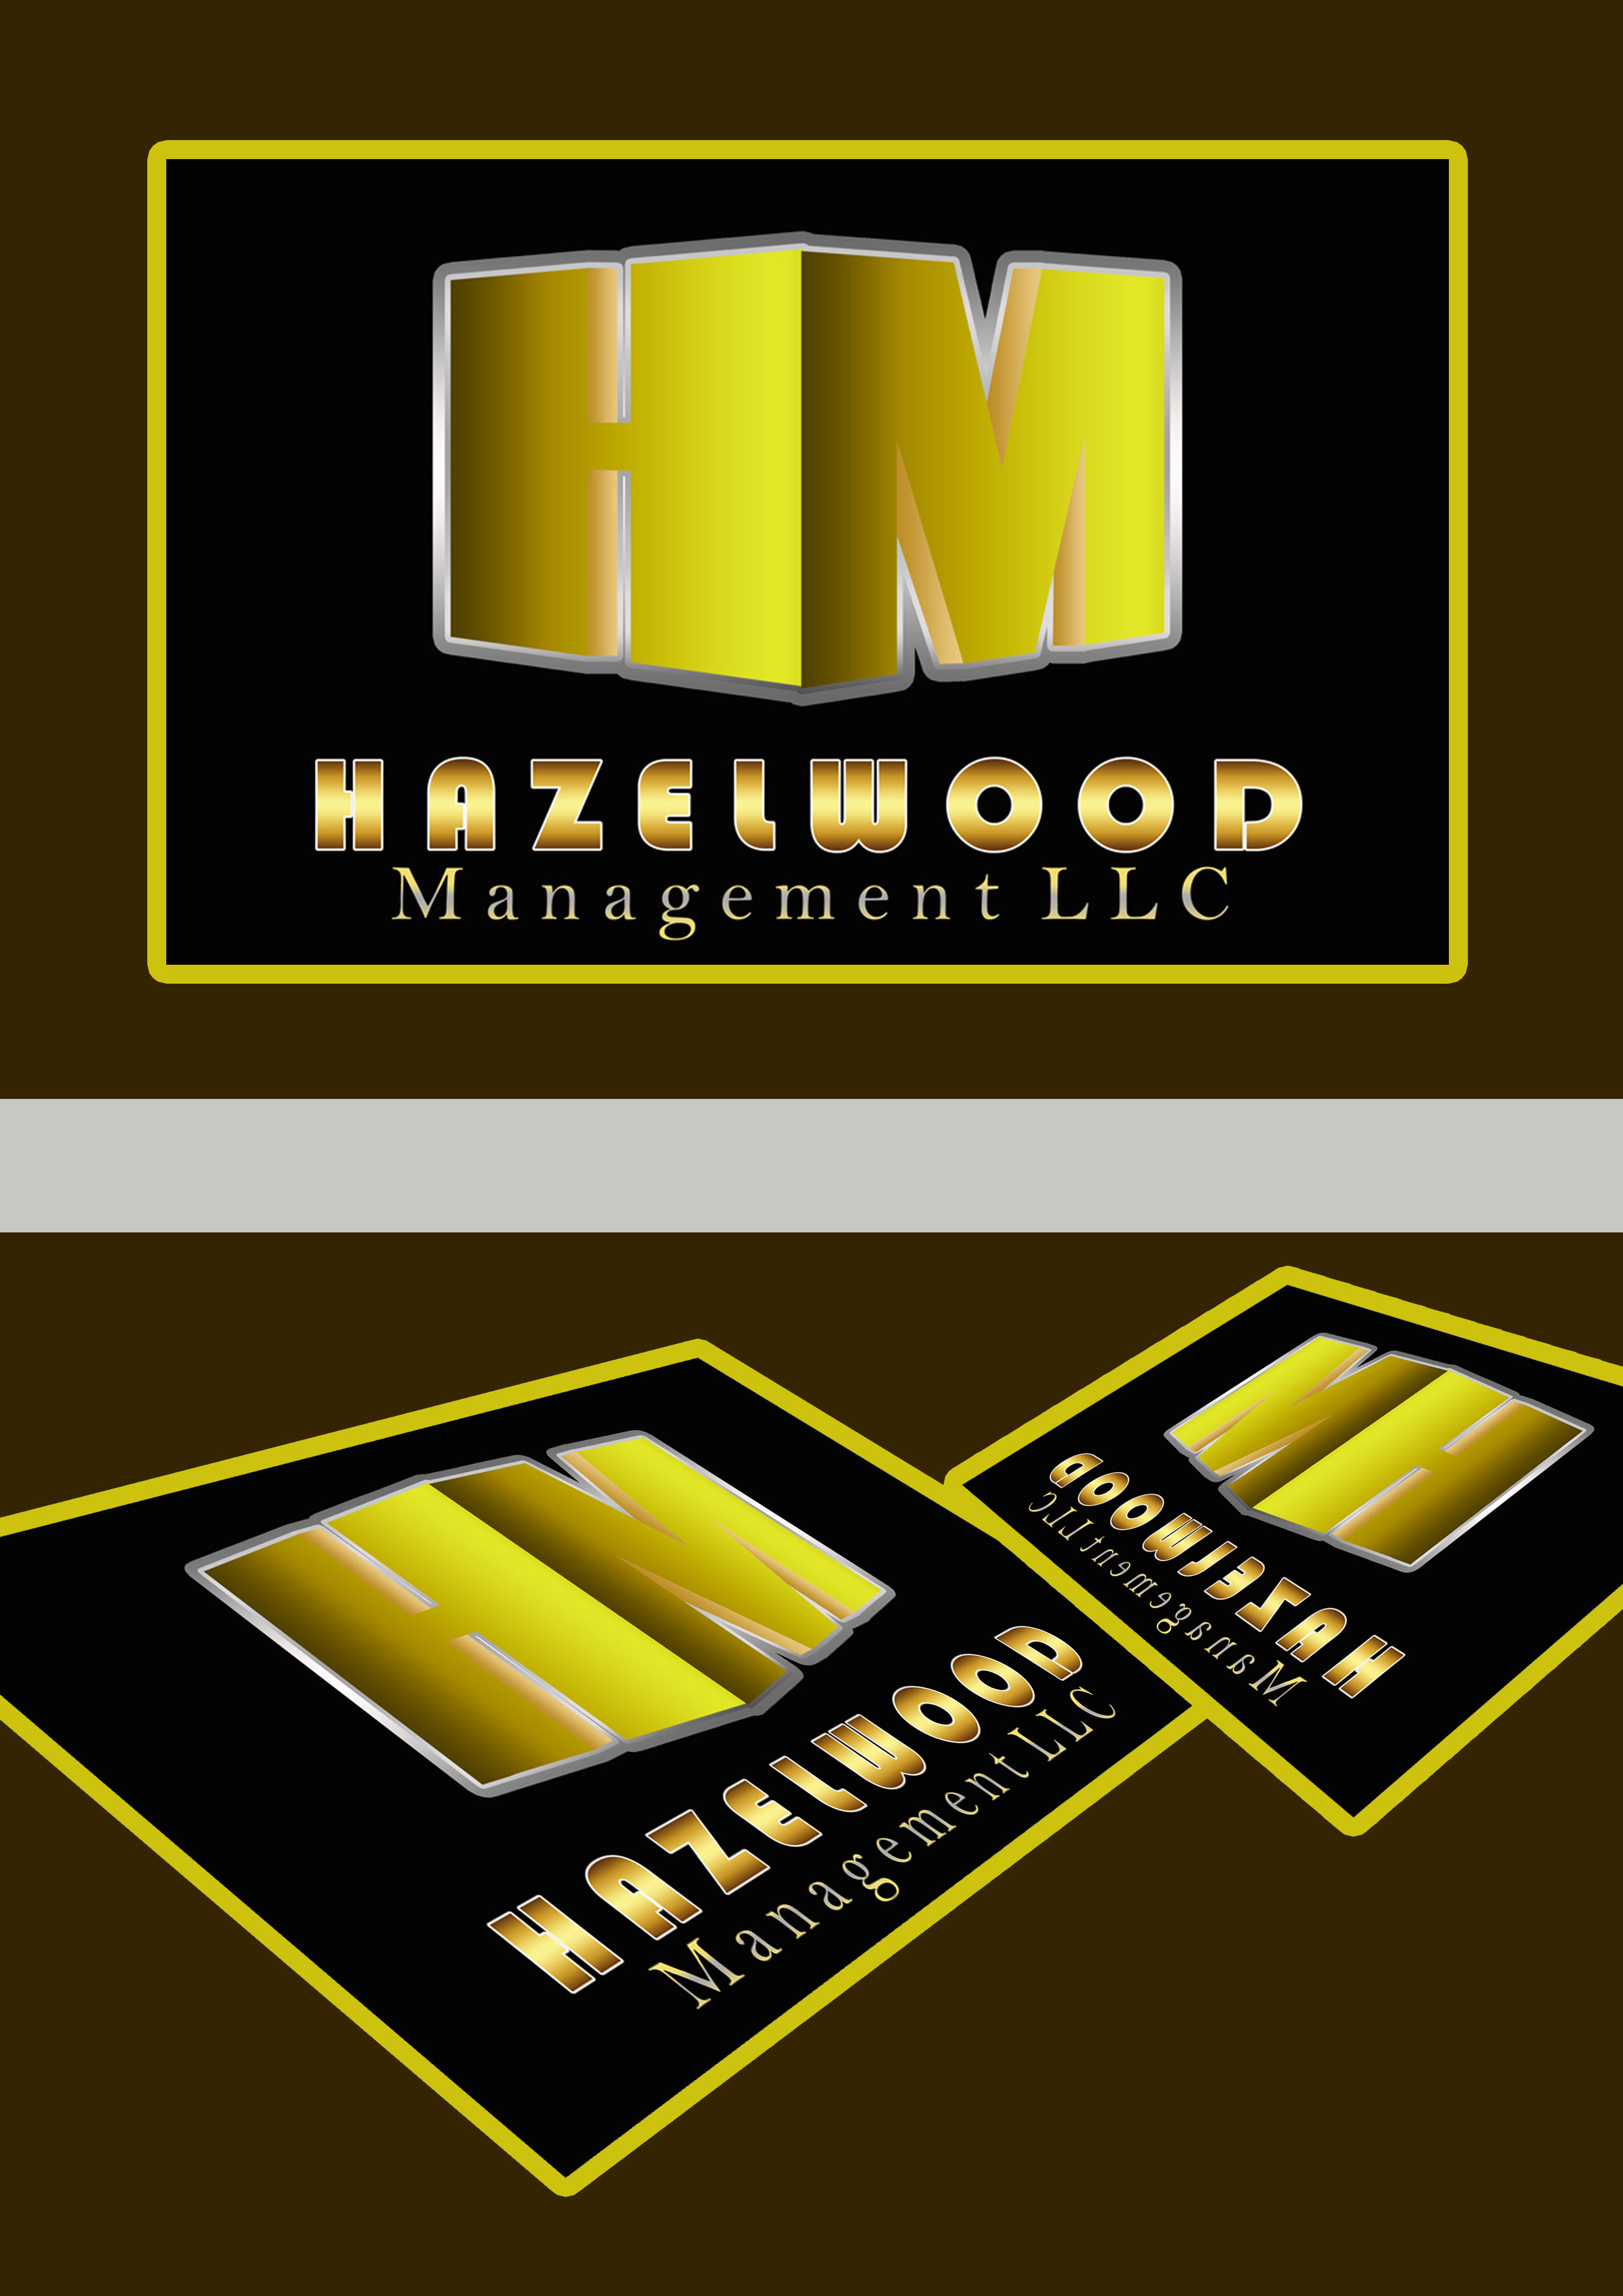 Logo Design by Jesther Jordan Minor - Entry No. 79 in the Logo Design Contest Hazelwood Management LLC Logo Design.